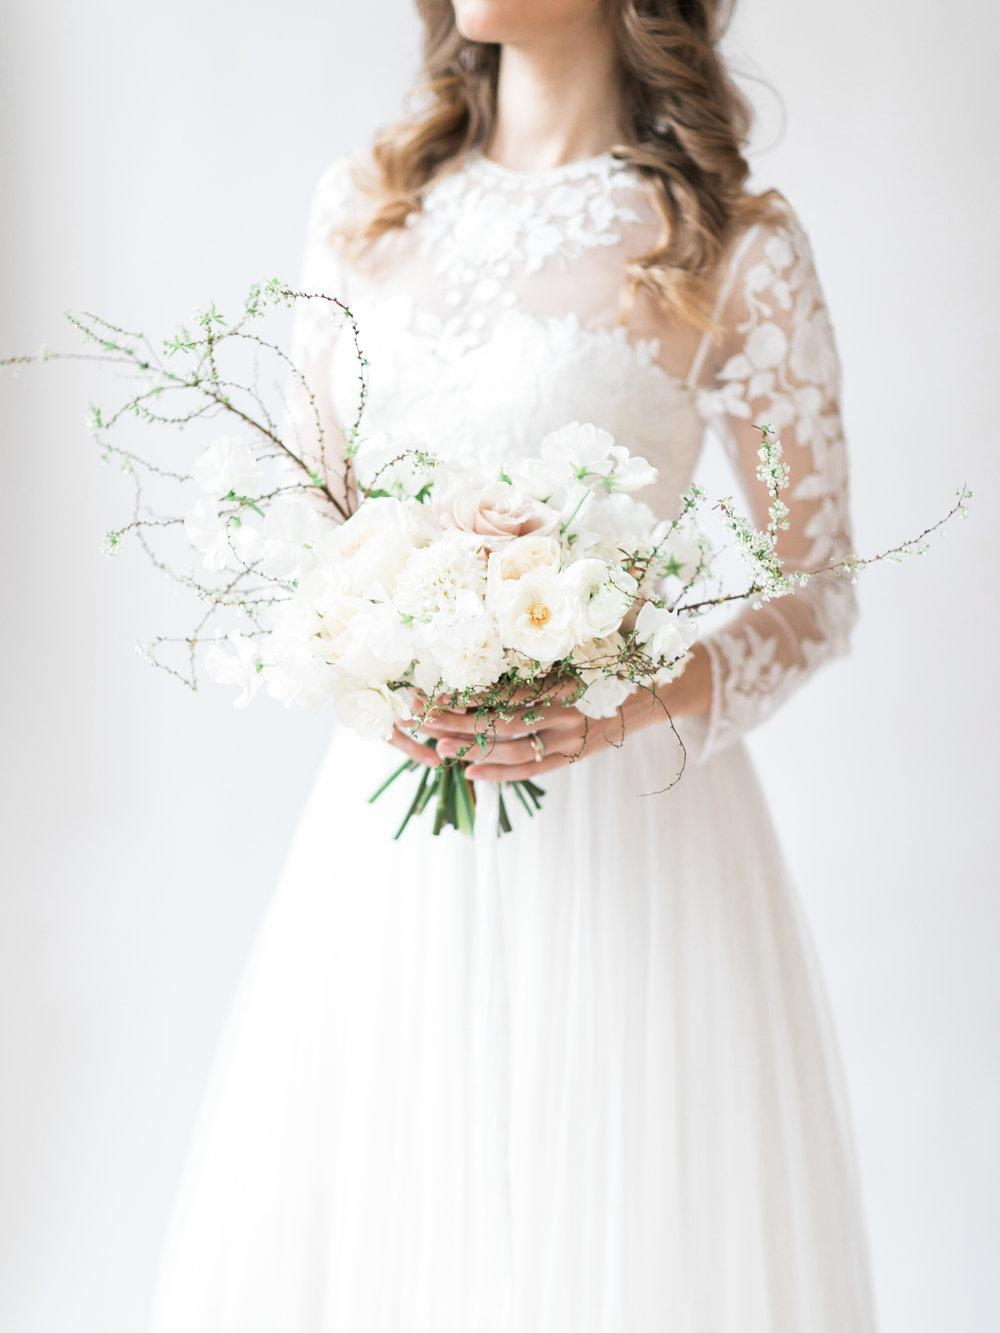 asher-gardner-photography-bryant-park-wedding-00066.jpg